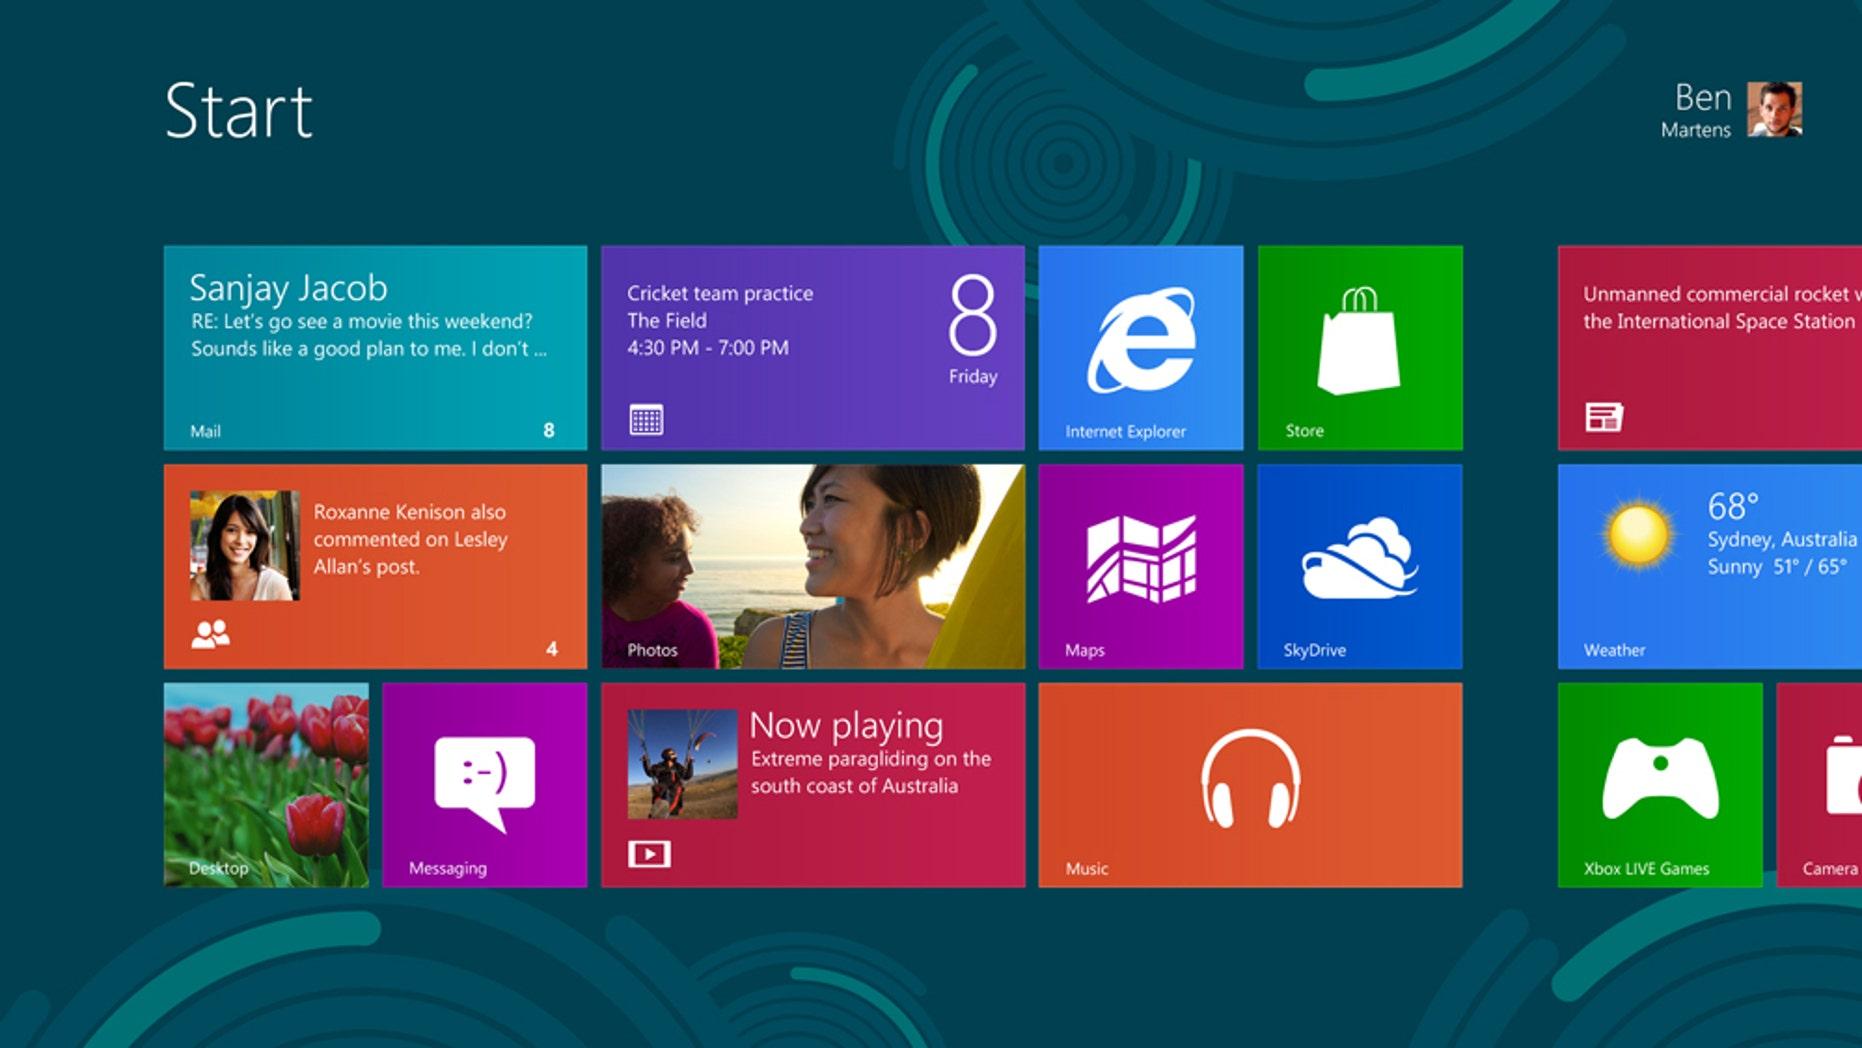 The new Windows 8 Start screen.